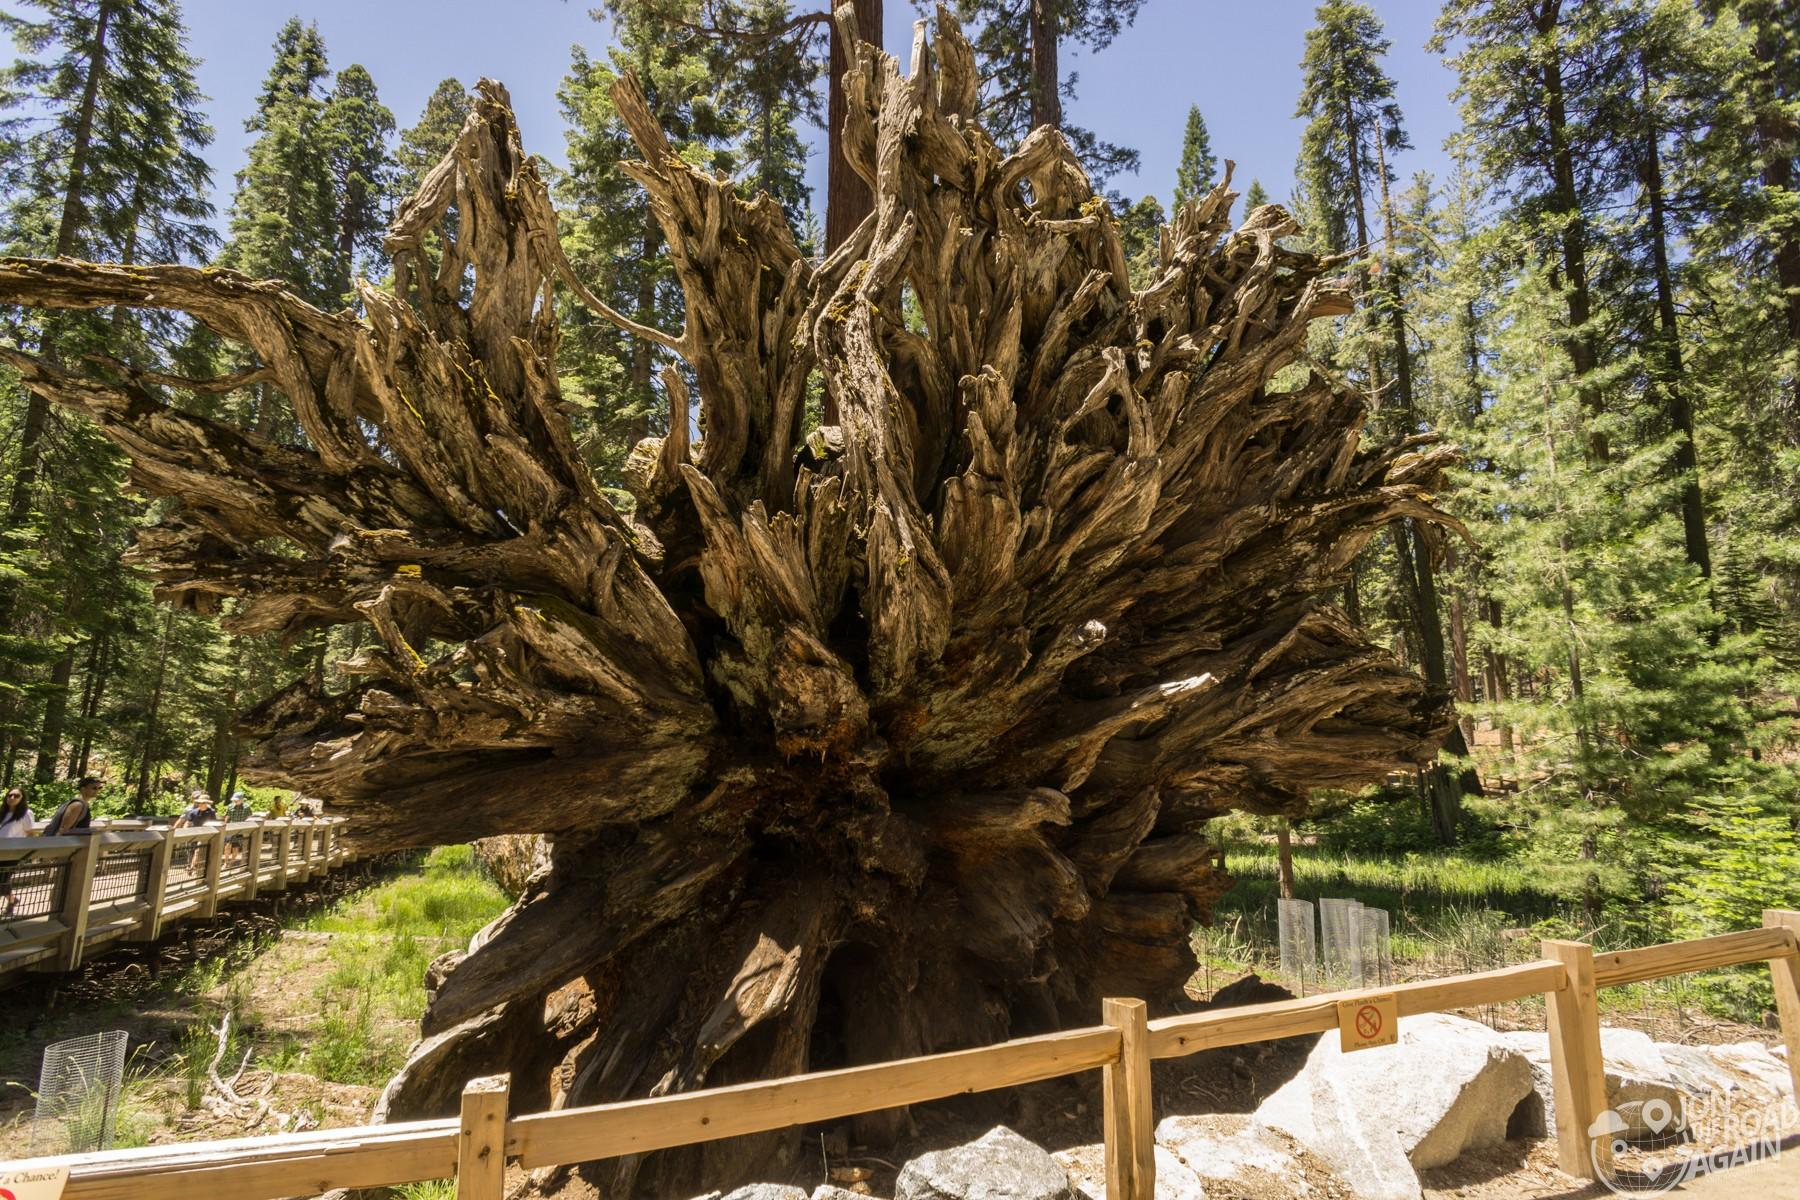 Fallen Monarch Yosemite